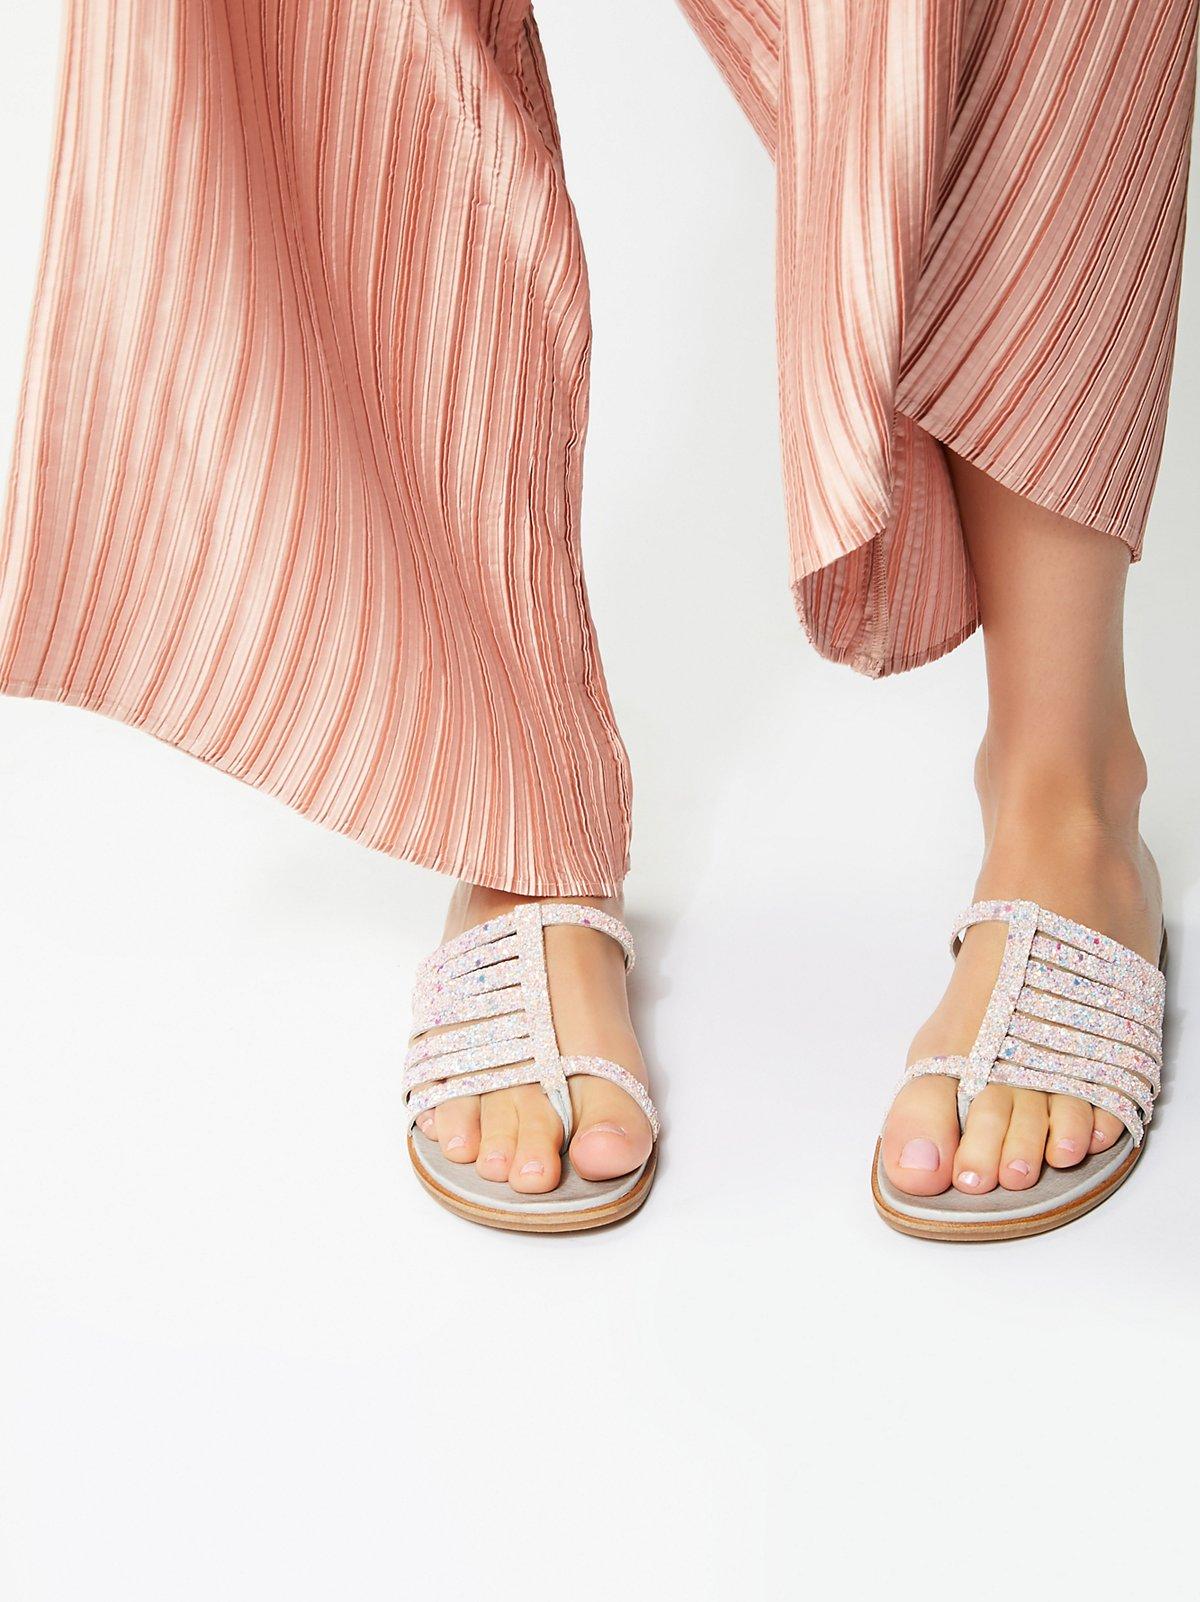 Prism凉鞋